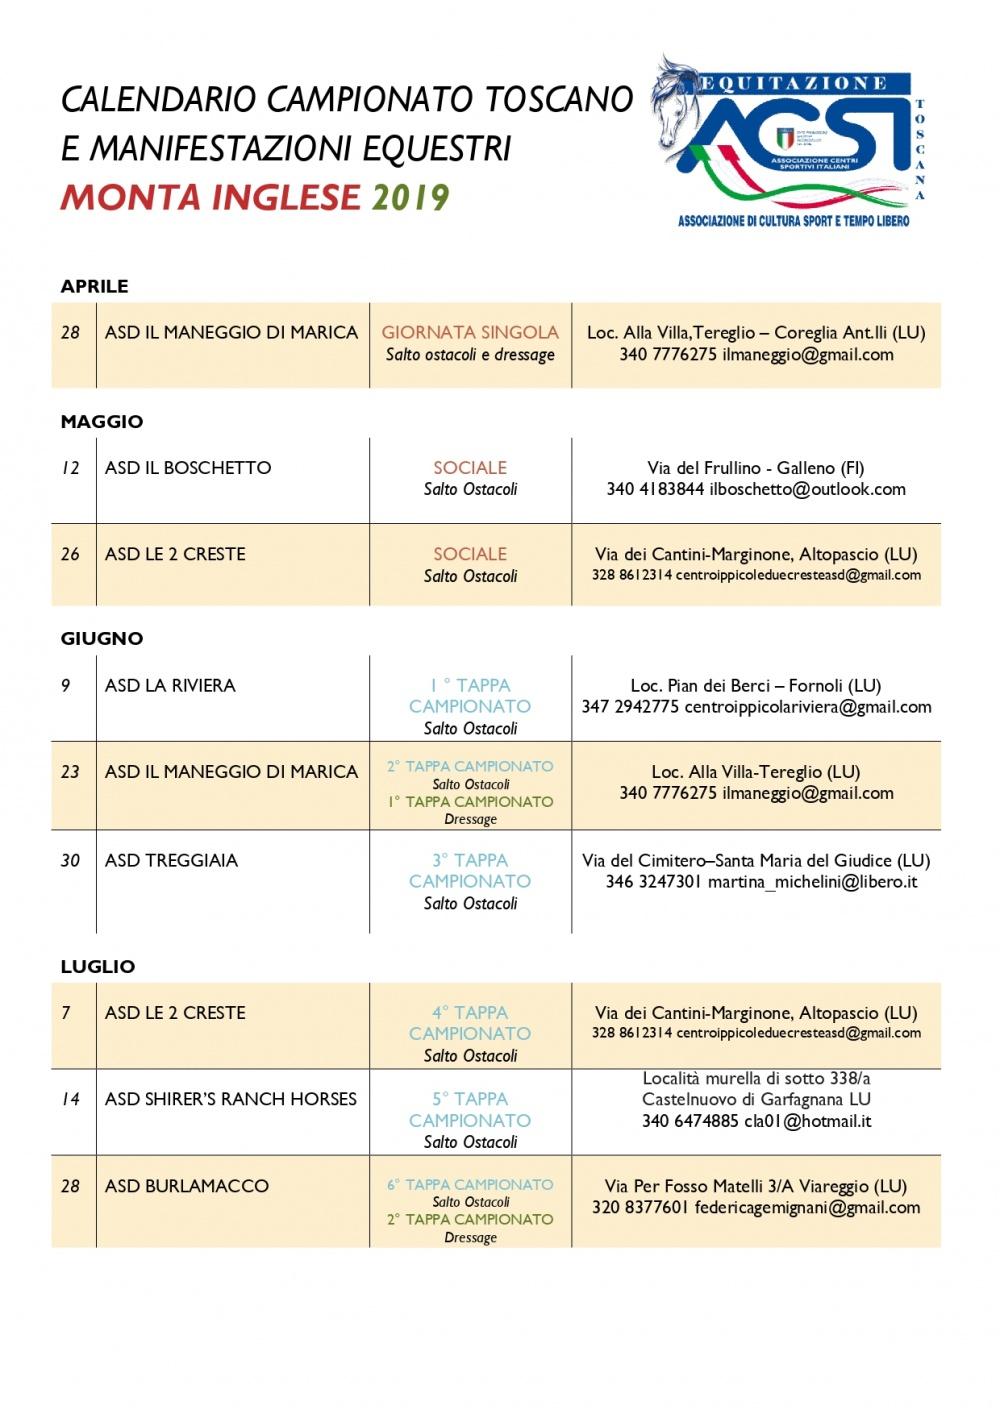 Calendario Regionale Salto Ostacoli.Campionato Toscano Monta Inglese 2019